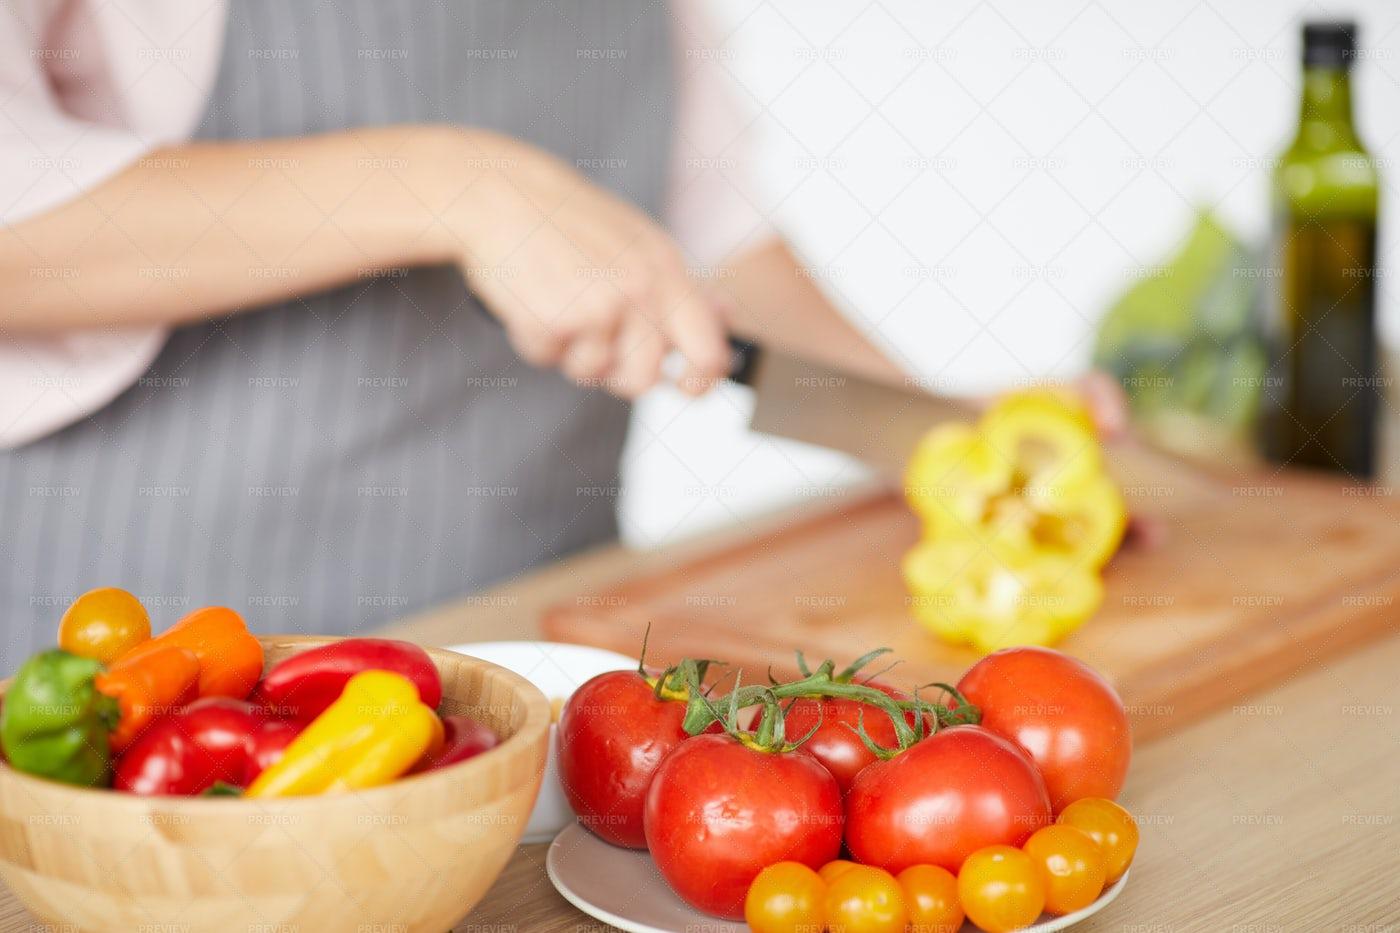 Woman Preparing Vegetable Salad: Stock Photos